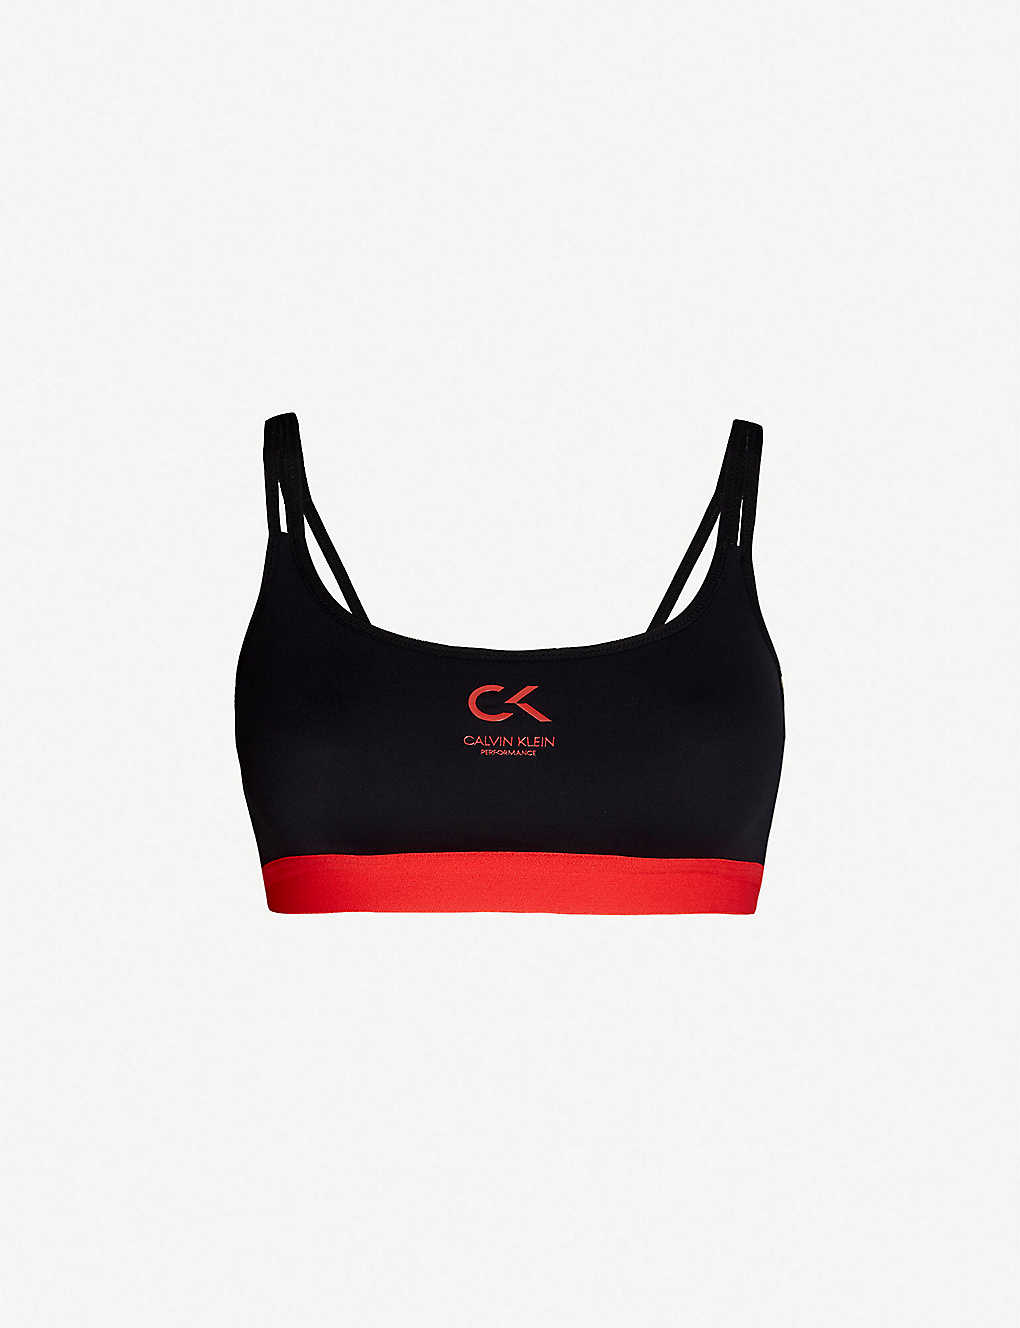 2fbbdfe62131e CALVIN KLEIN - Performance logo-print stretch-jersey sports bra |  Selfridges.com